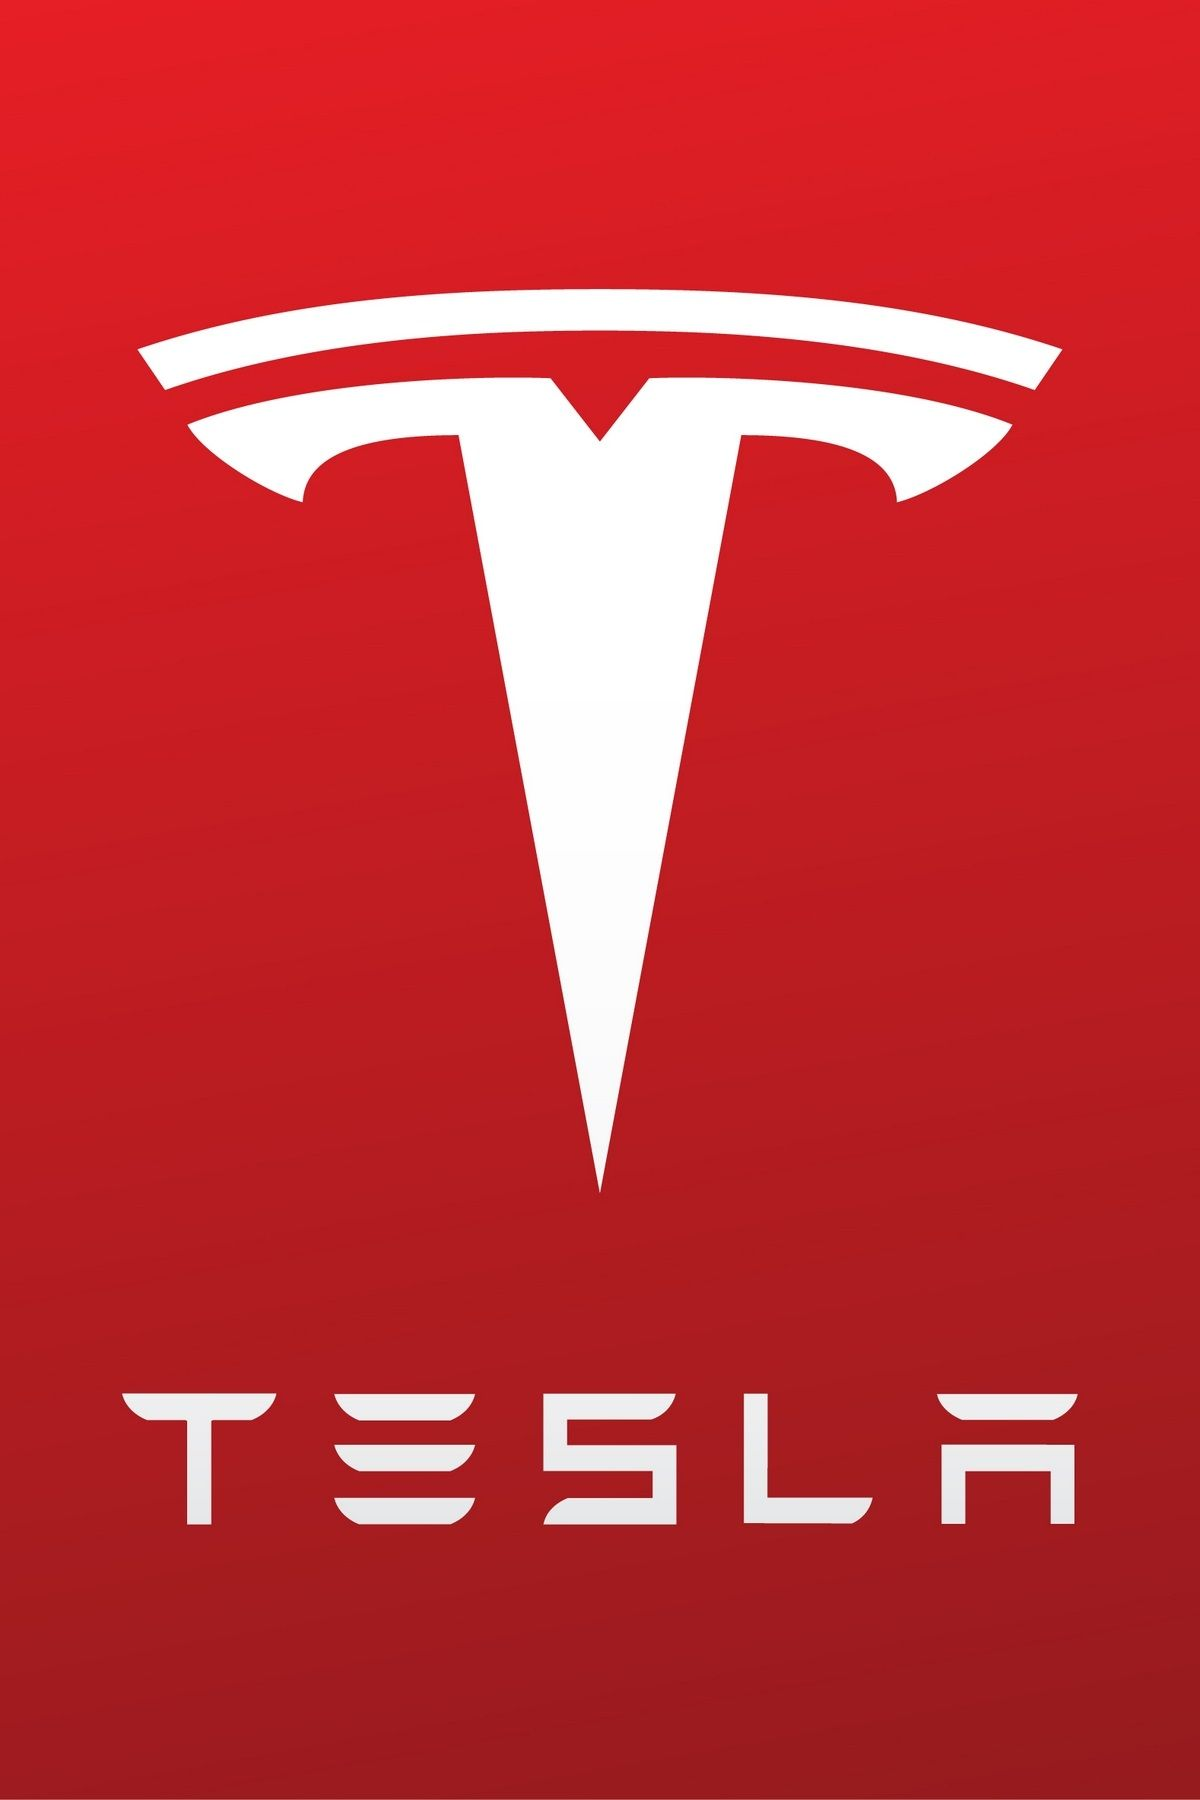 Tesla Logo [Motors] PNG Free Downloads, Logo Brand Emblems ...